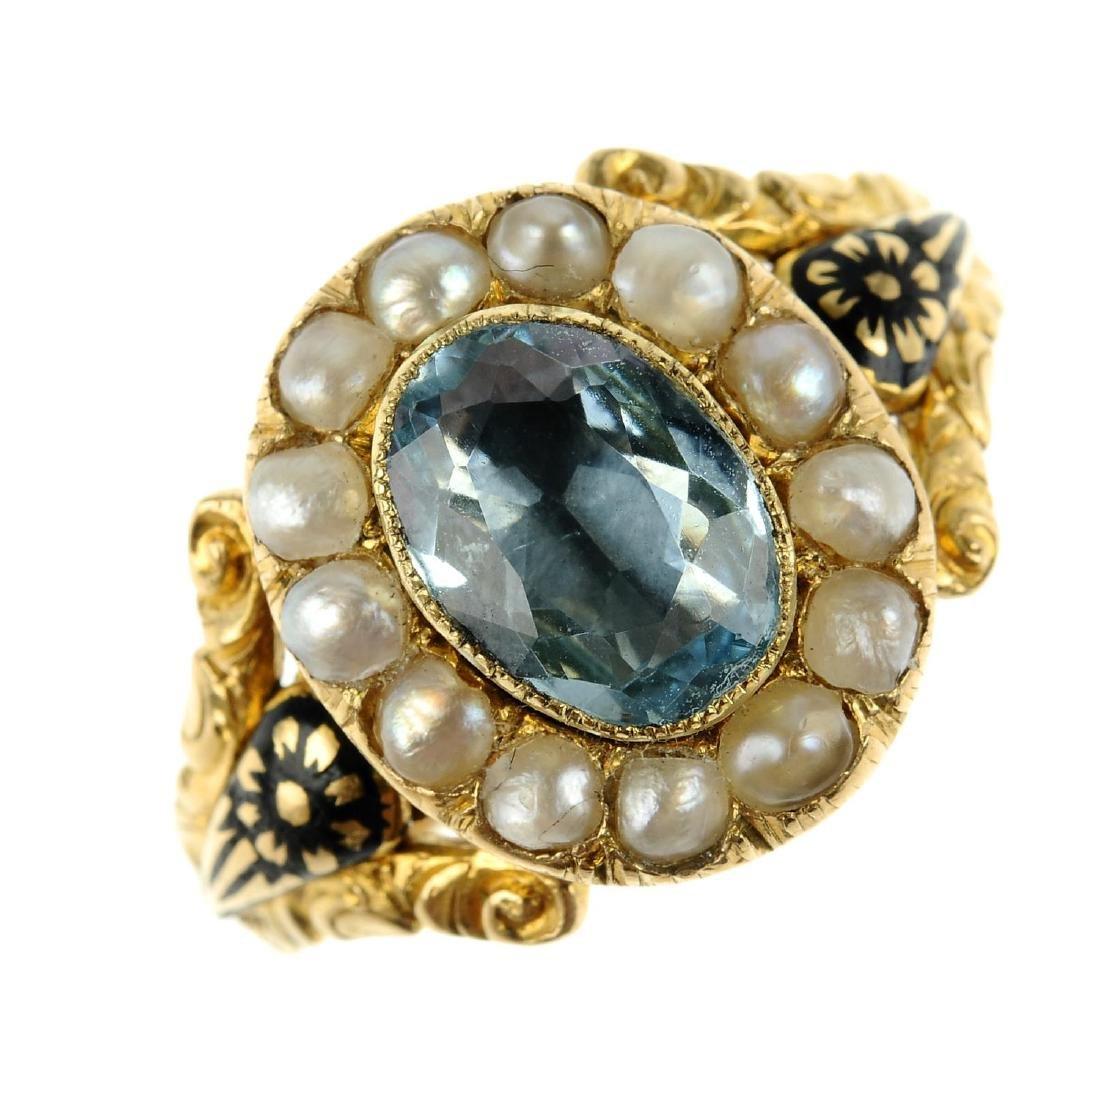 An early Victorian 18ct gold aquamarine, split pearl